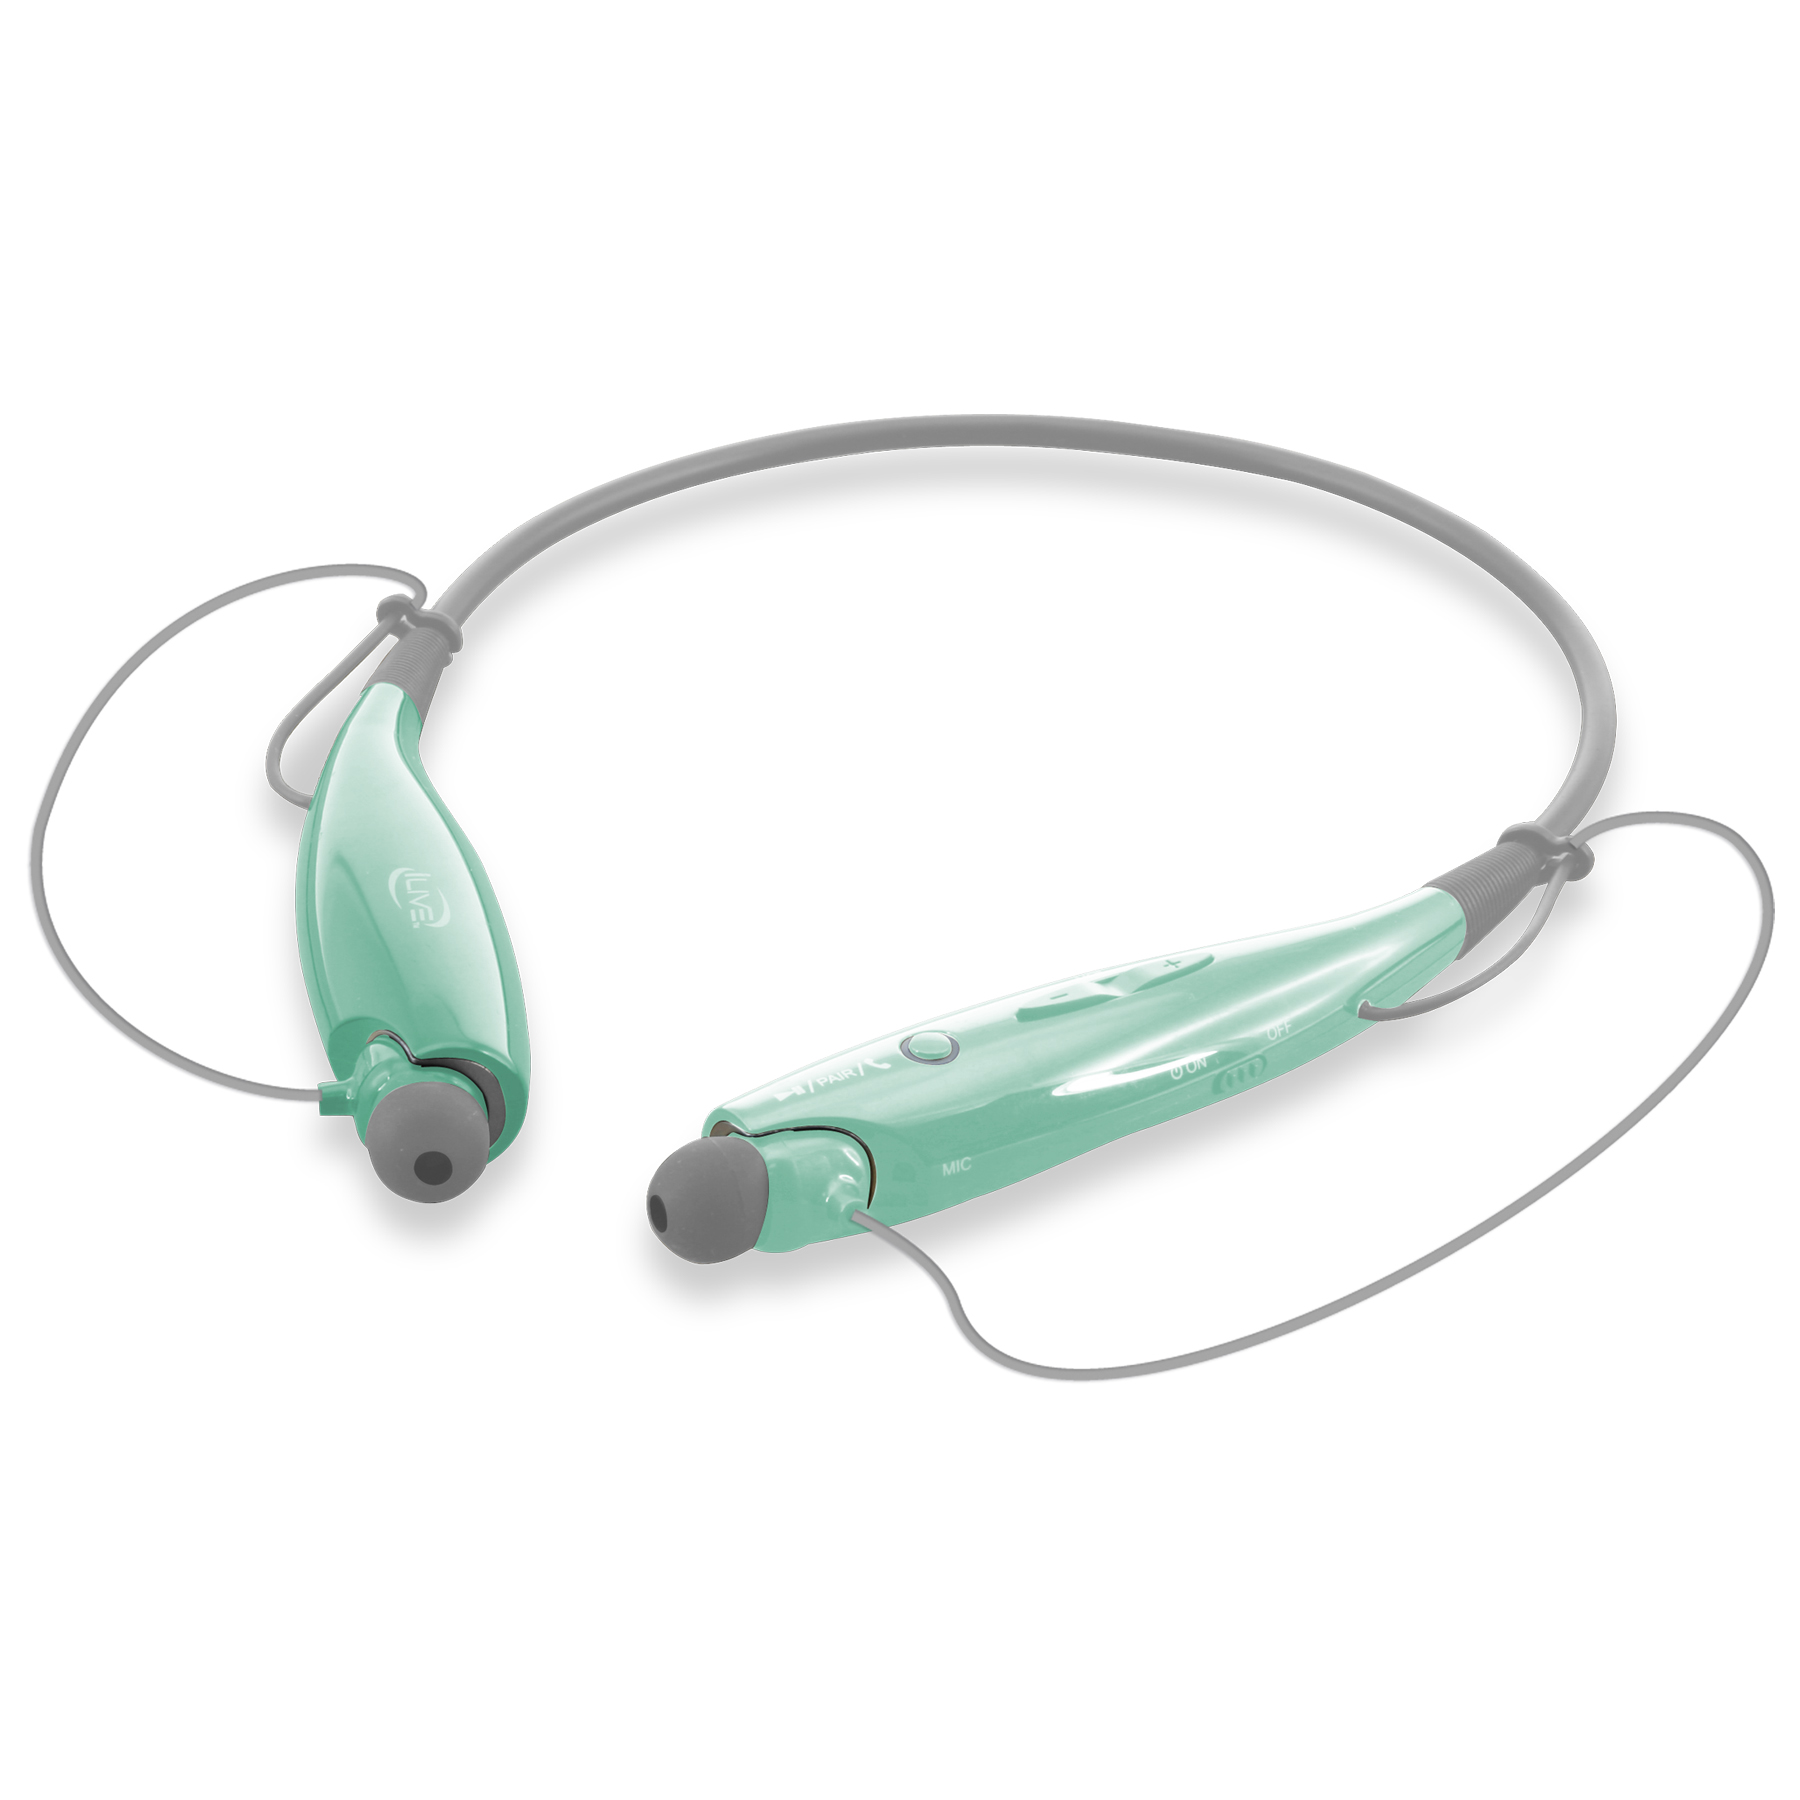 hight resolution of ilive wireless stereo neckband headset iaeb25 multiple colors walmart com